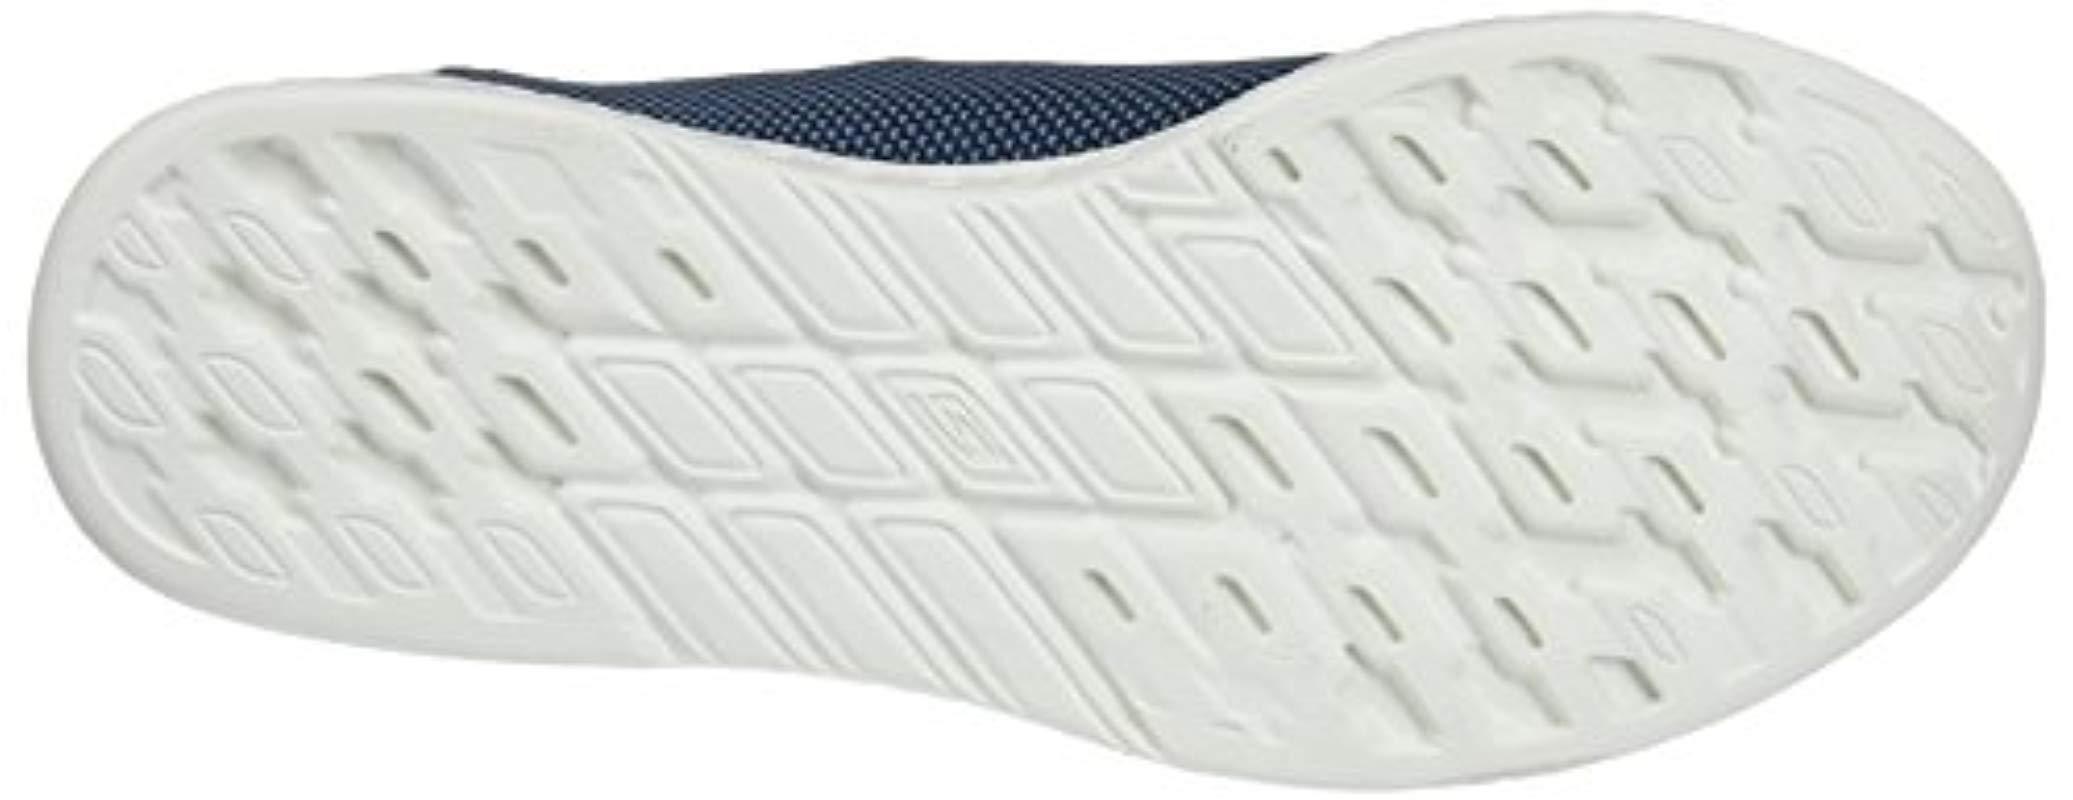 On-The-go Glide-Effusive Skechers de hombre de color Azul